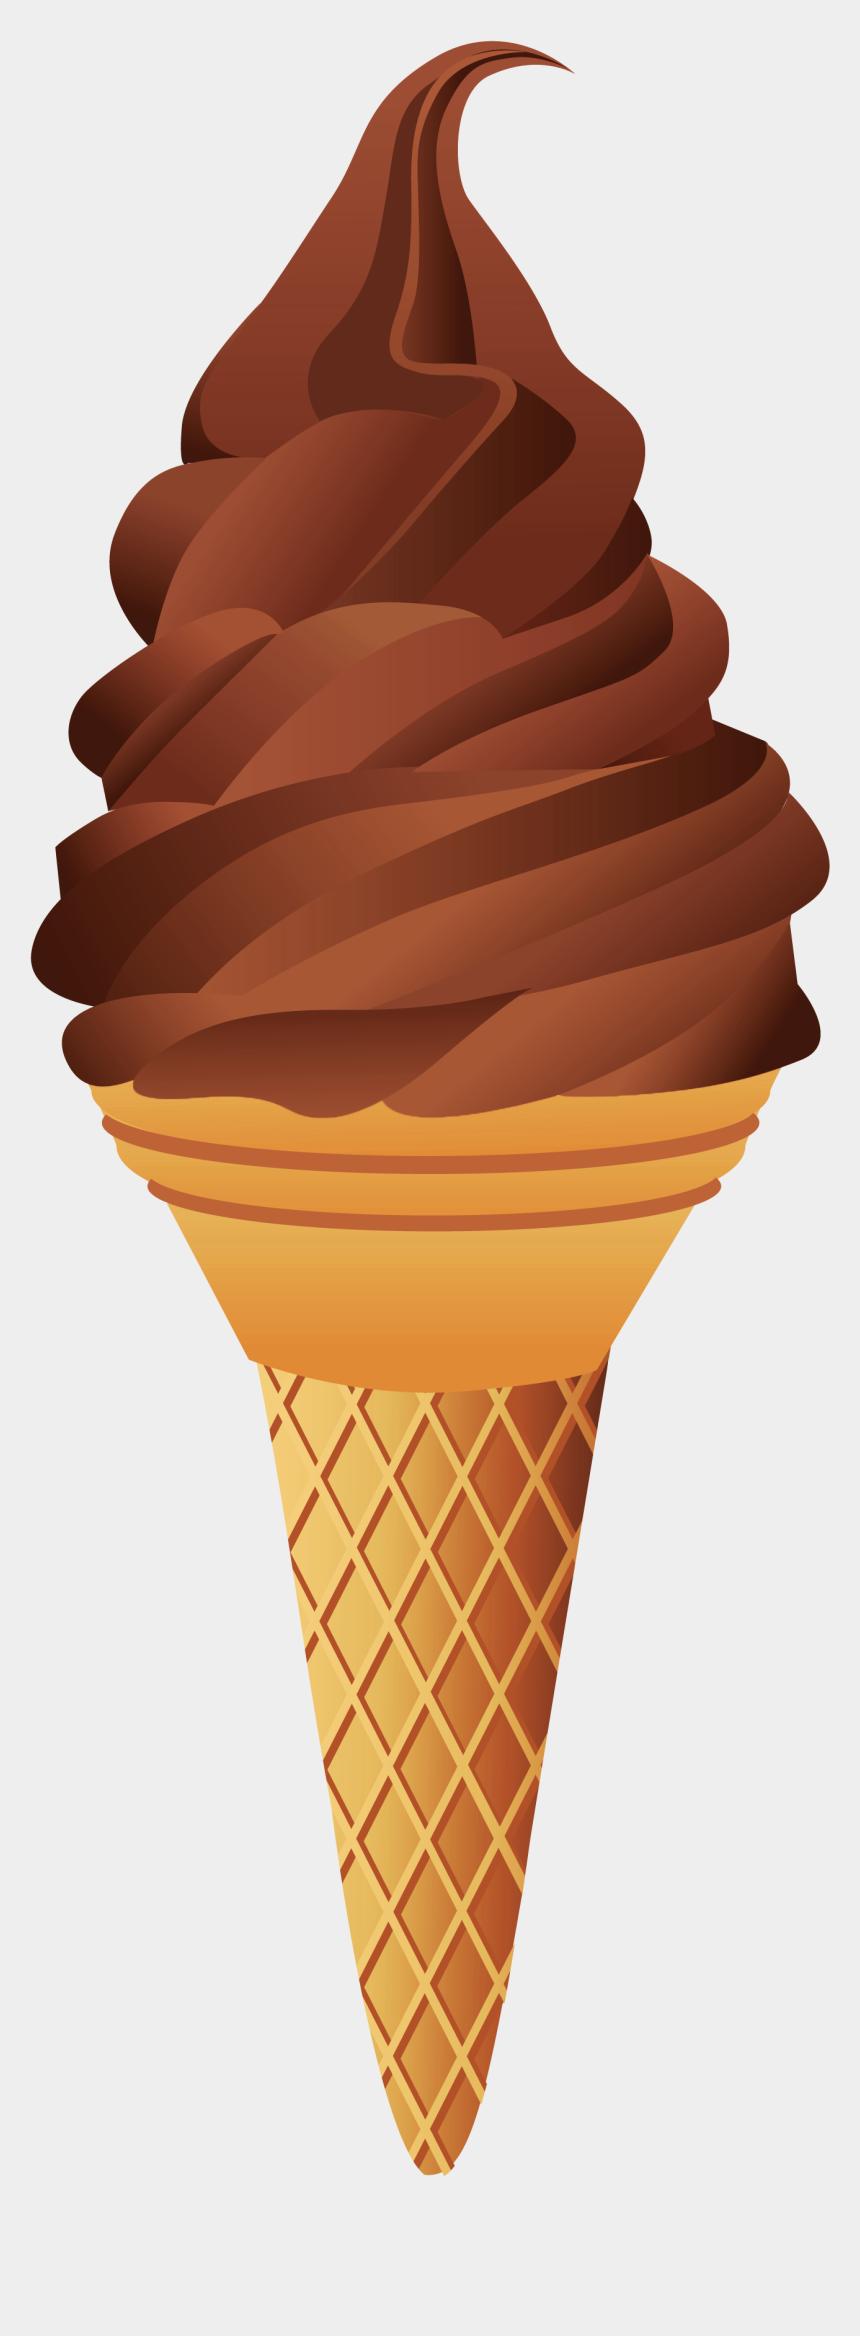 ice cream clipart, Cartoons - Chocolate Ice Cream Clipart , Png Download - Chocolate Ice Cream Cone Clipart